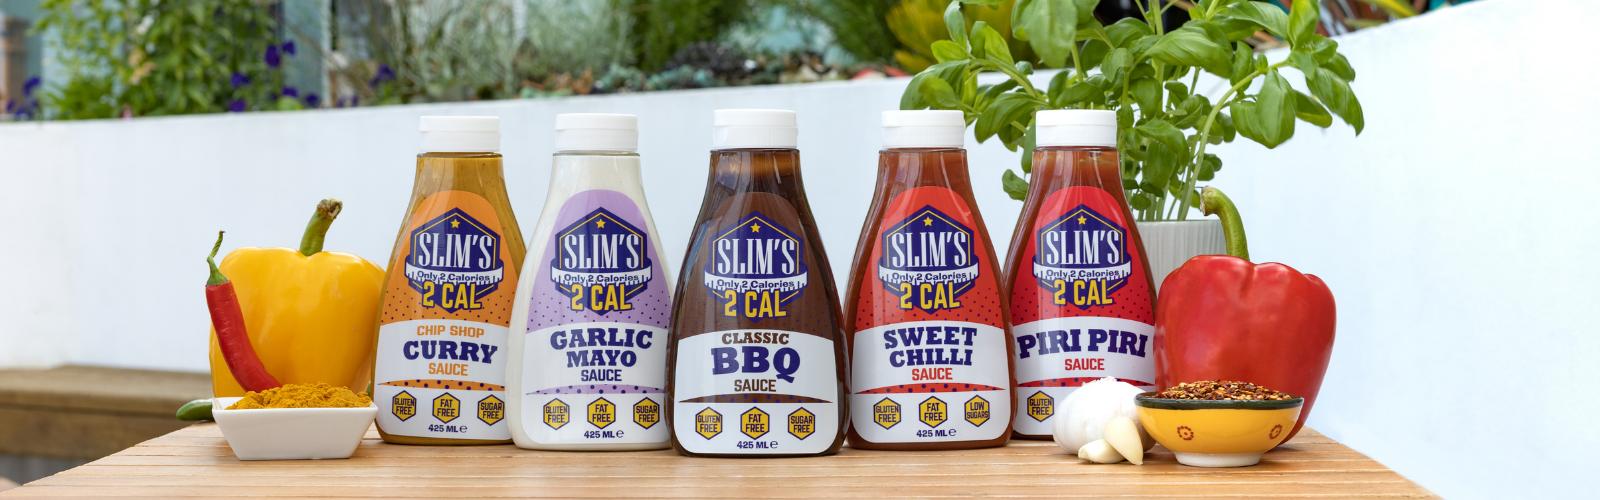 2 Cal Sauces Shop Page Banner